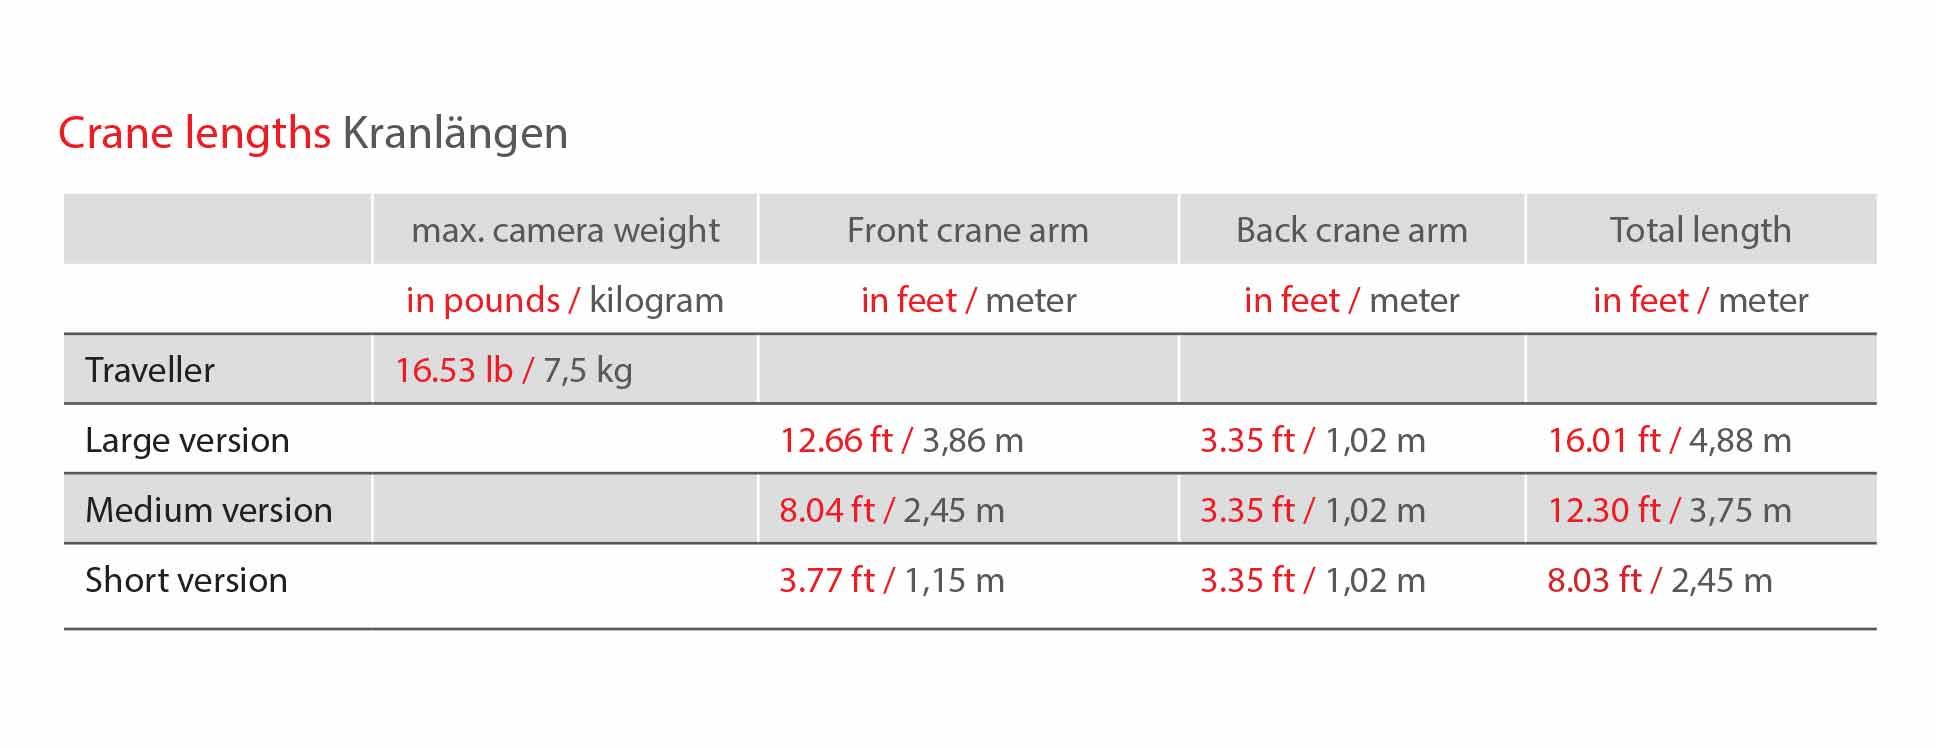 abc-products-traveller-crane-technische-daten